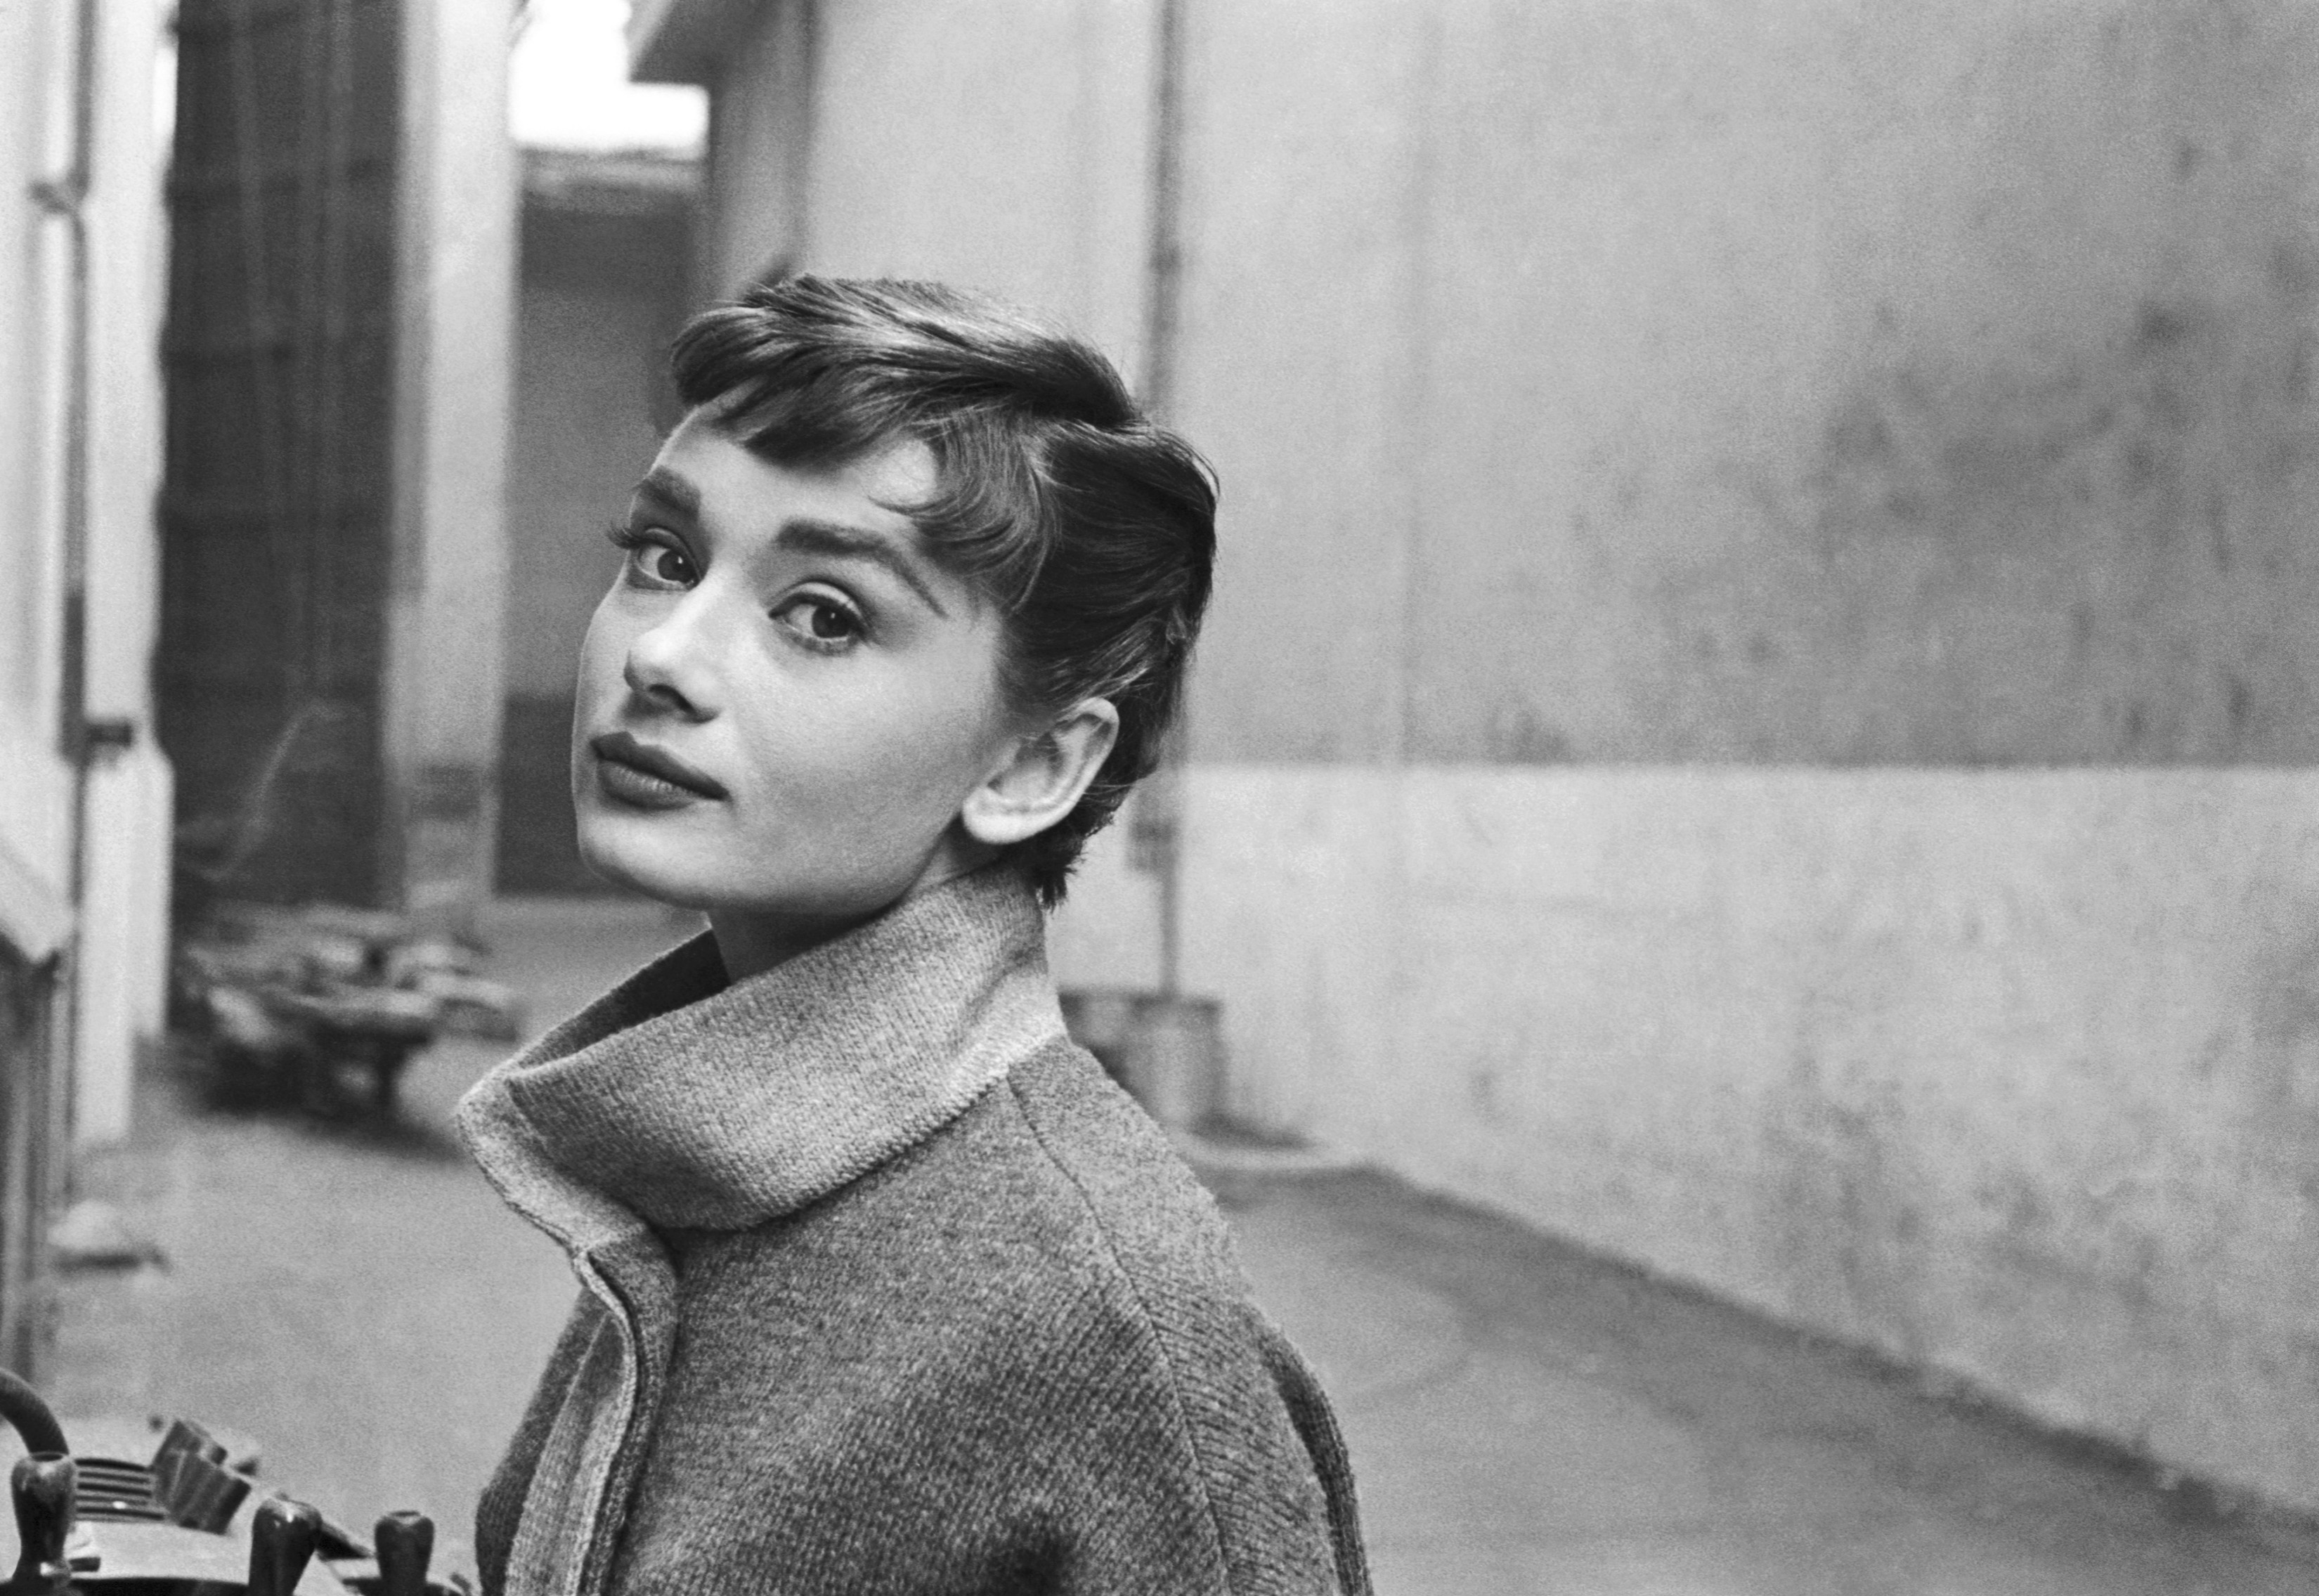 audrey-hepburn-1954-mark-shaw-mptvimages_com.jpg